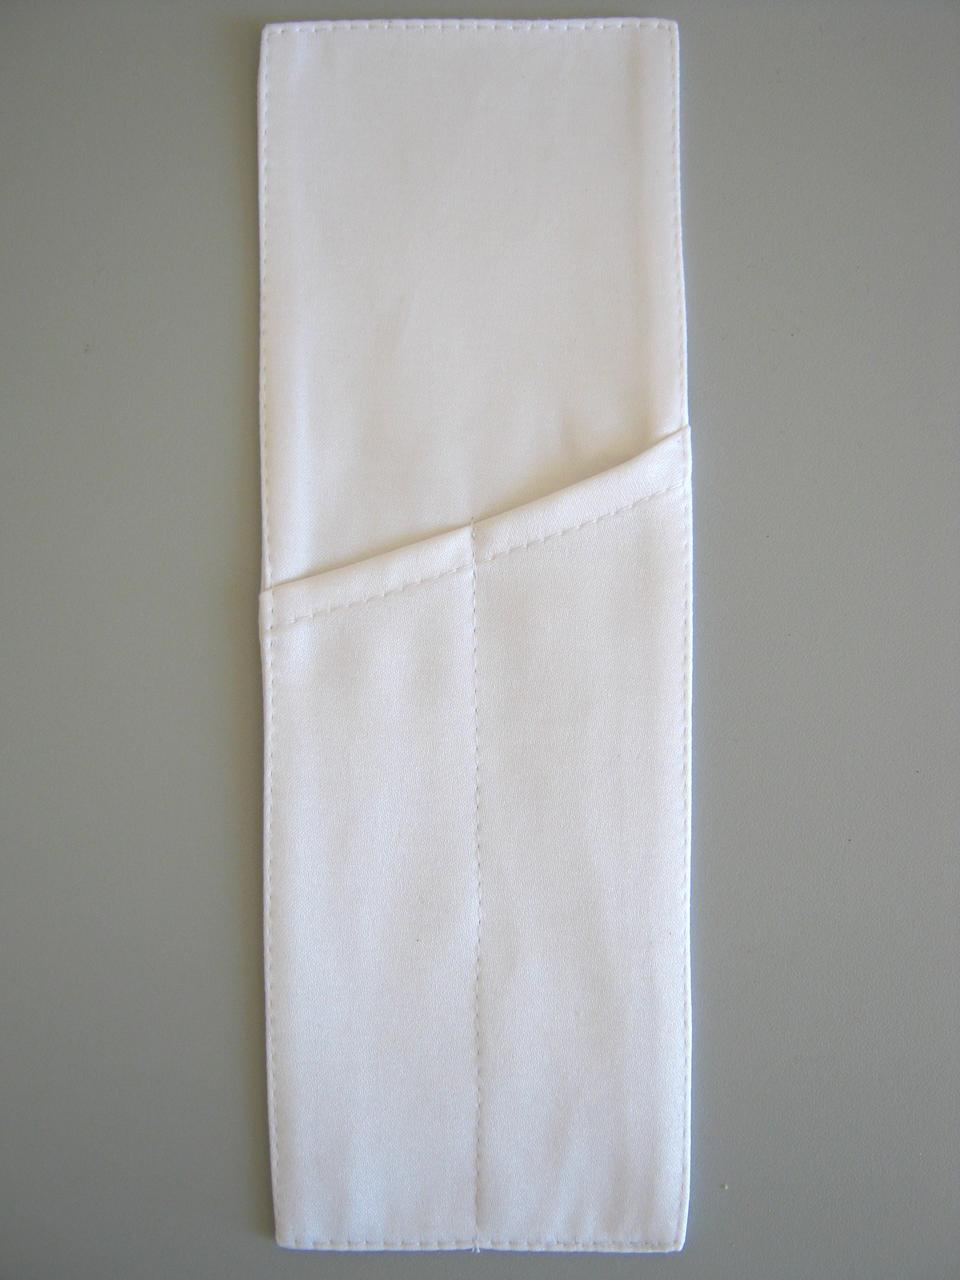 Куверт (конверт),на 2 прибора , ткань Ричард гладь, белый.